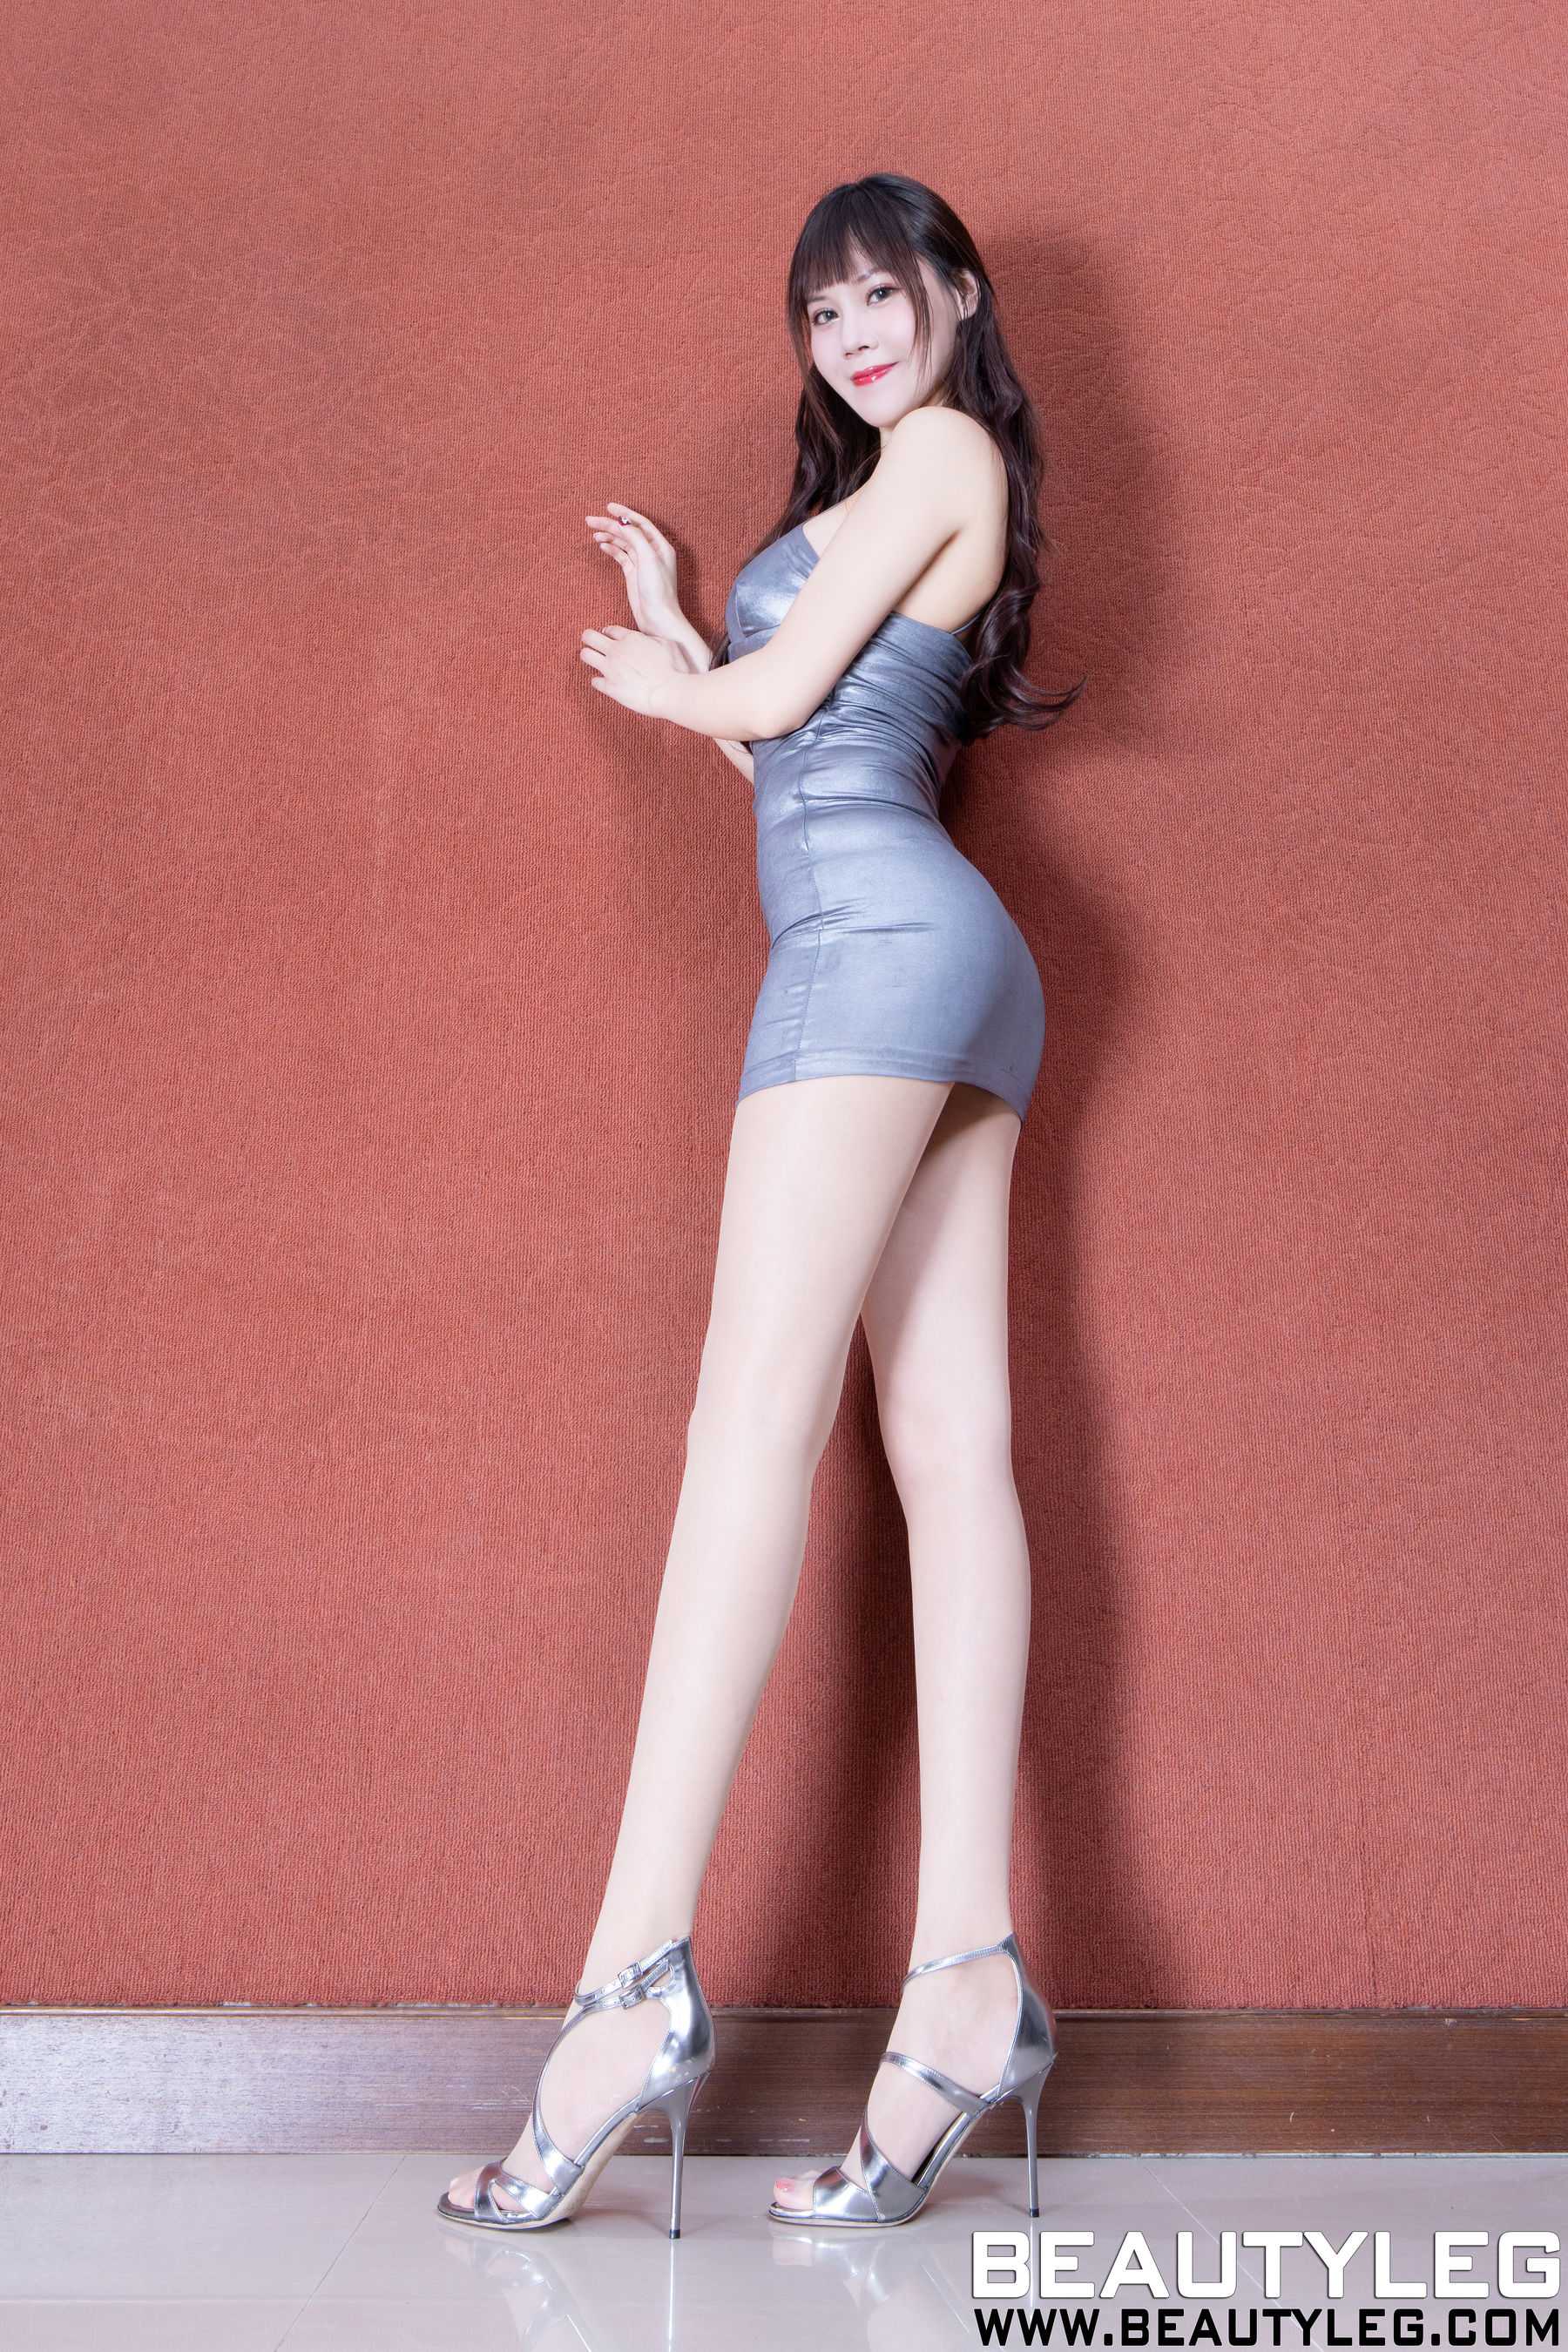 VOL.1866 [Beautyleg]肉丝美腿:陈玉雪(腿模Abby)超高清个人性感漂亮大图(45P)